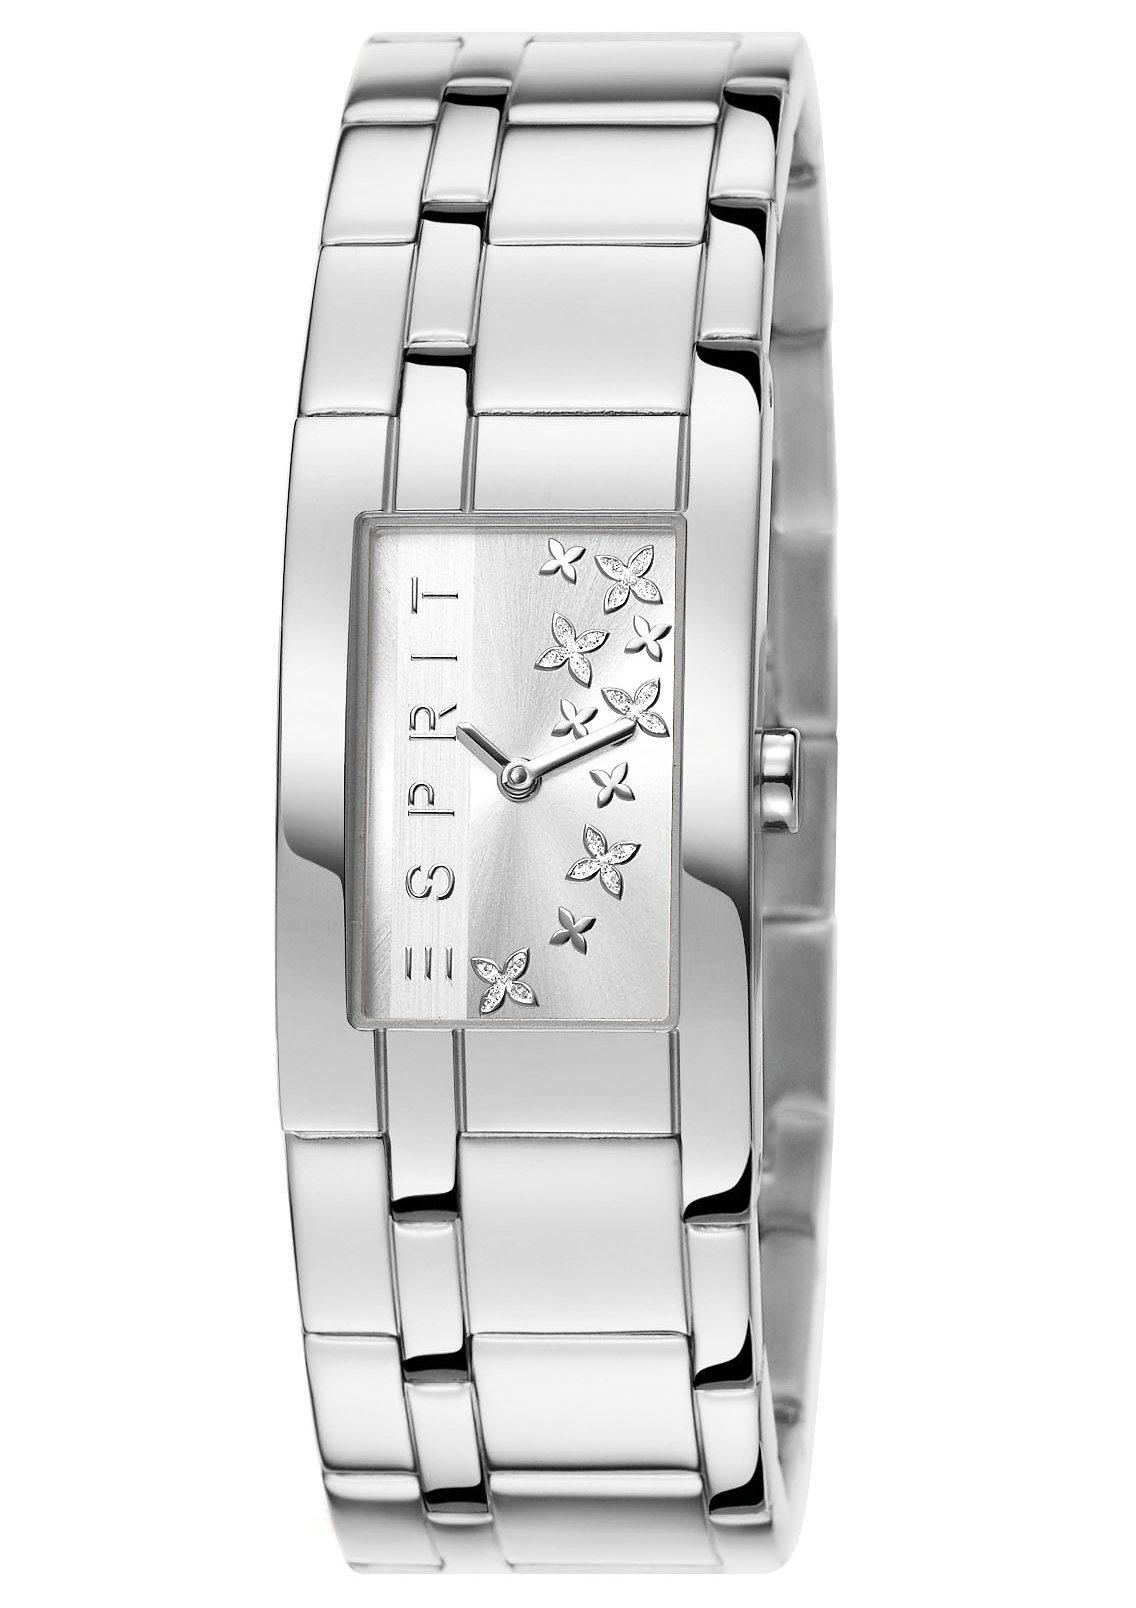 ESPRIT, Armbanduhr, ´´ESPRIT-TP10729 SILVER, ES107292001´´